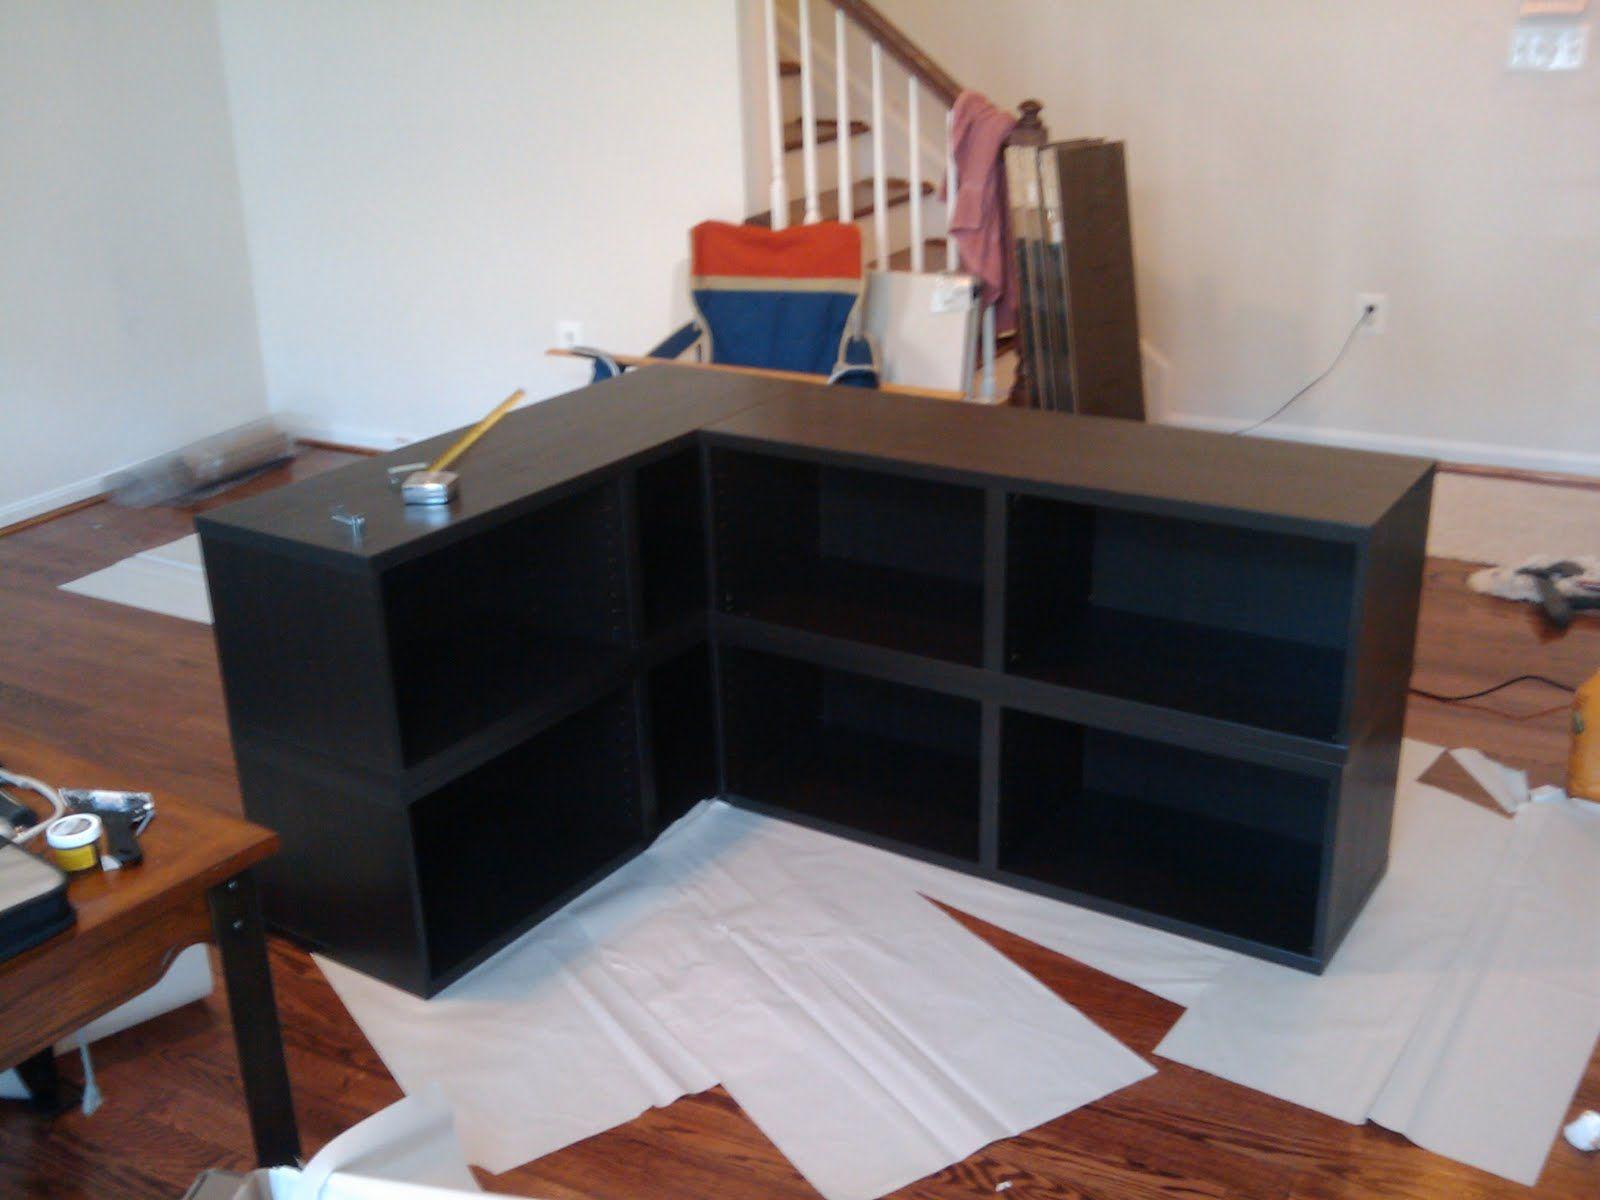 Ikea L-Shaped Dry Bar